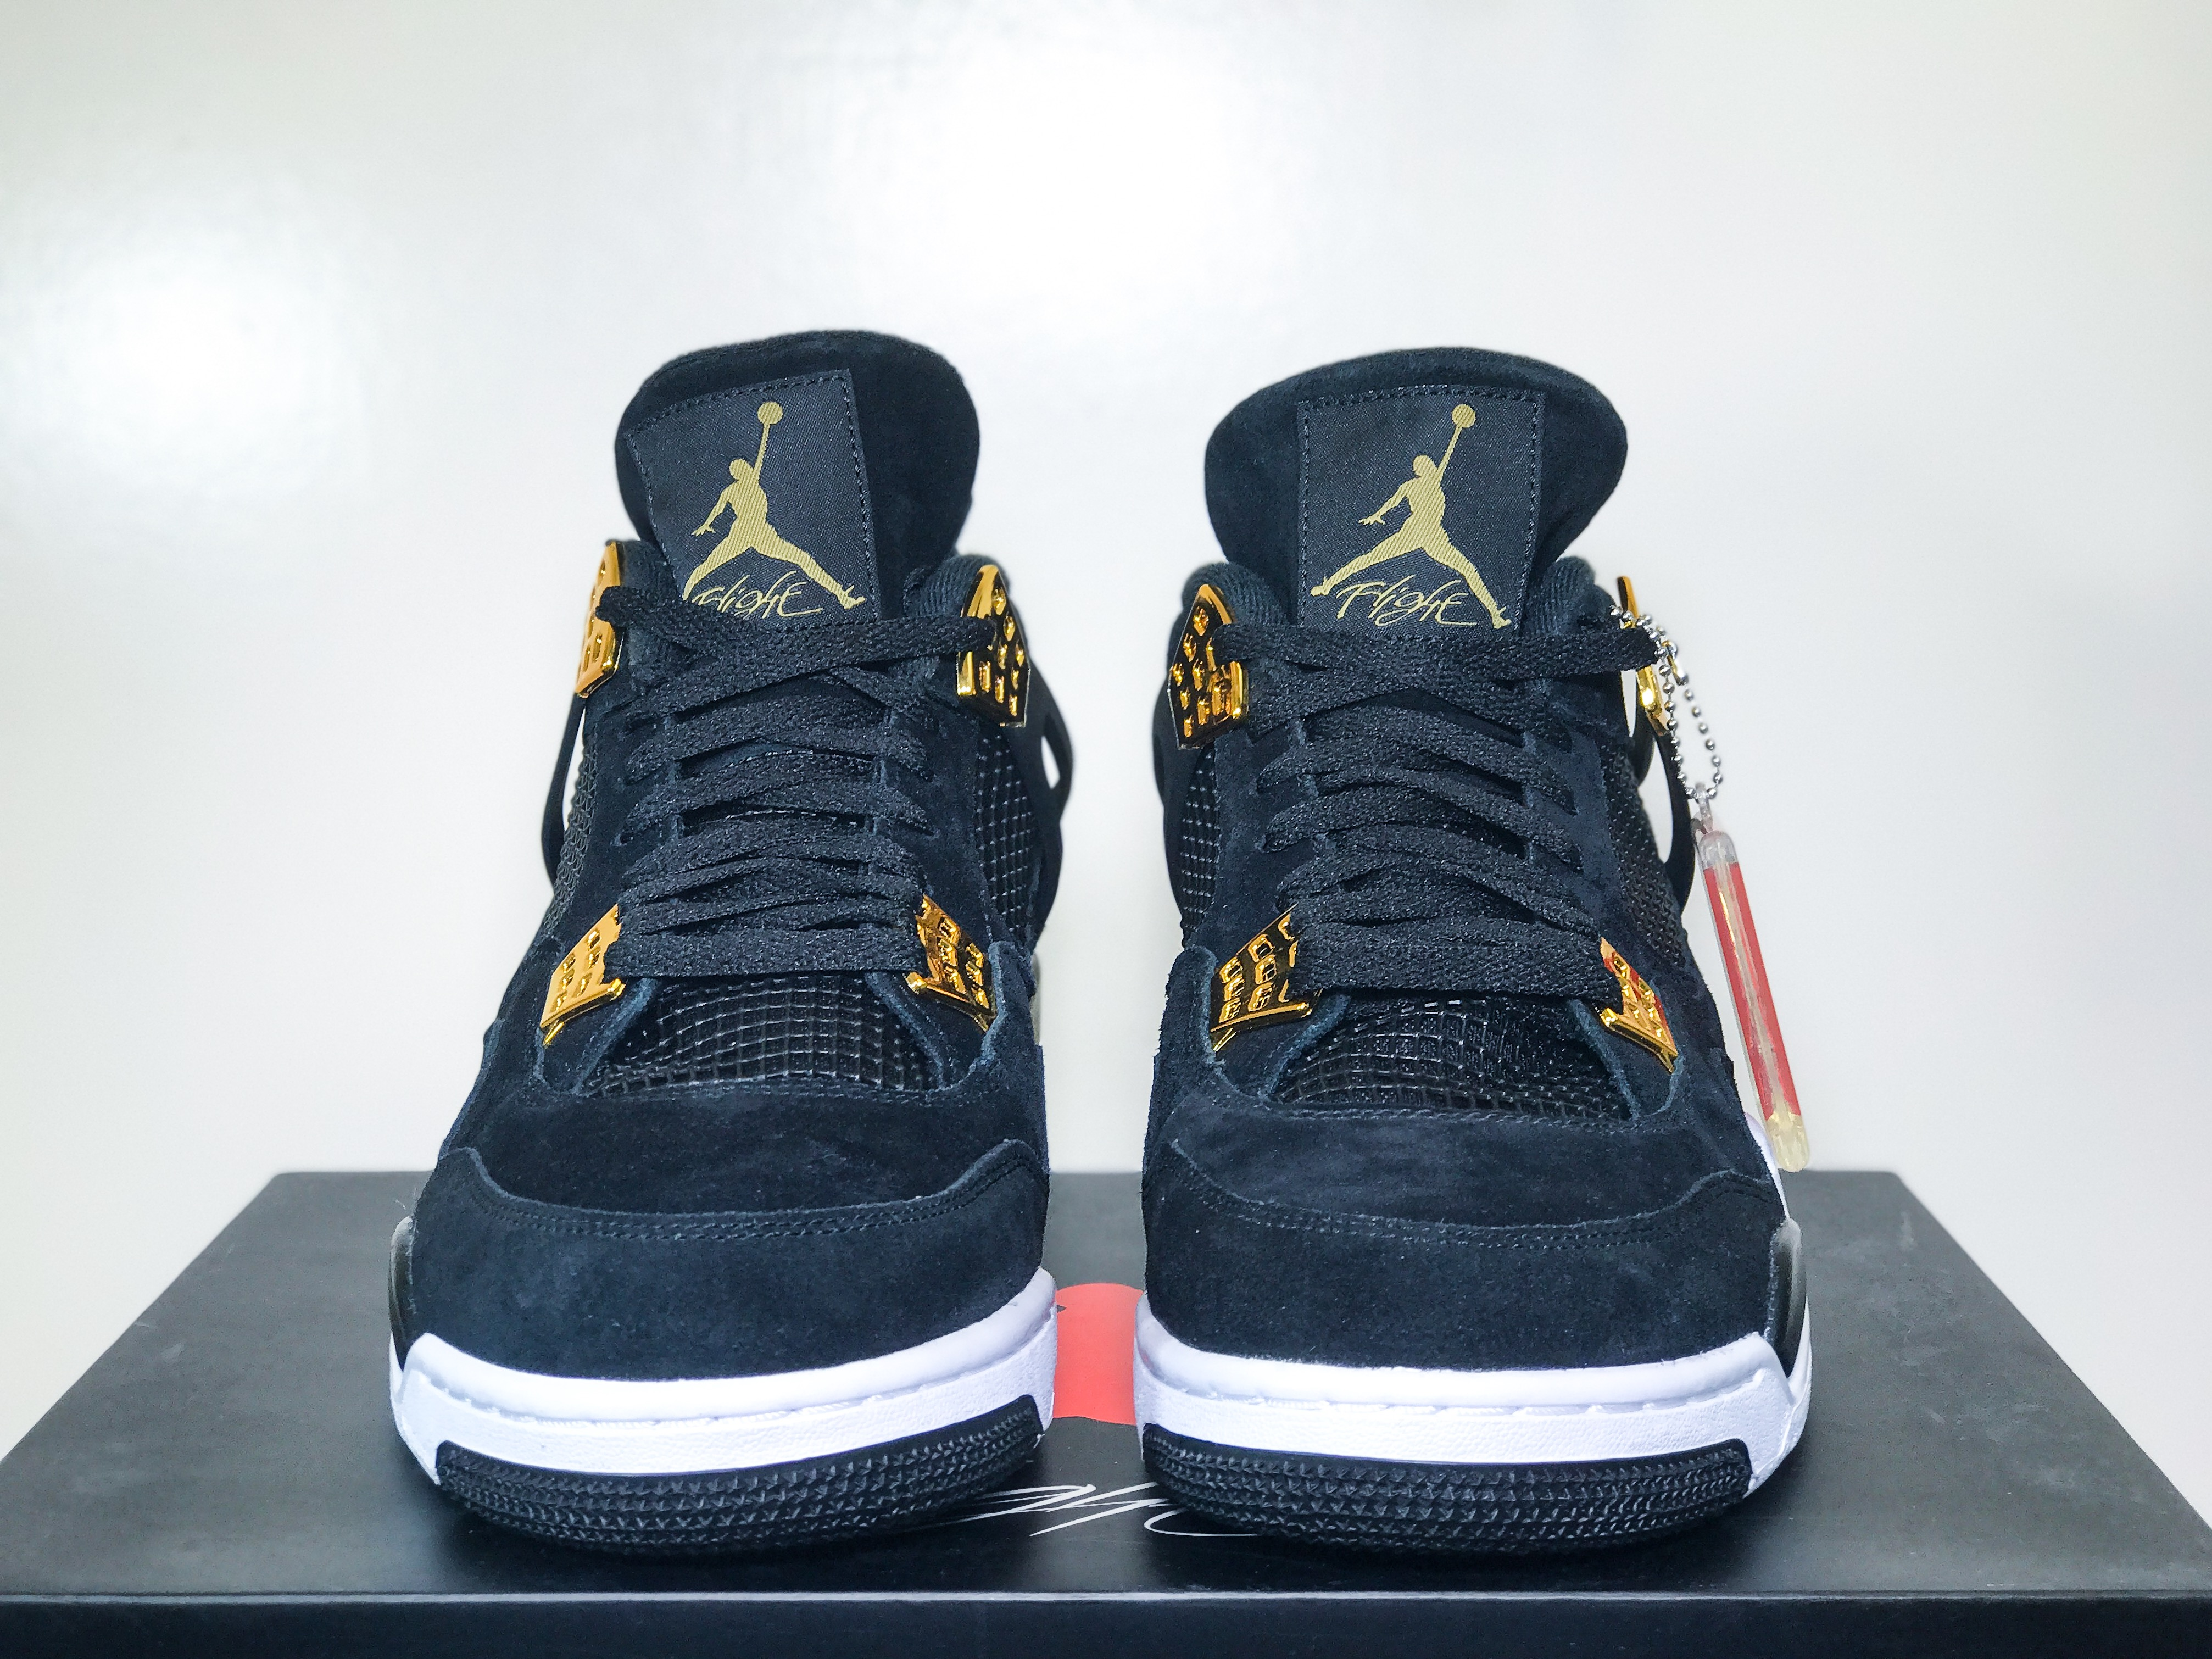 competitive price ba390 a2c19 Air Jordan Retro 4